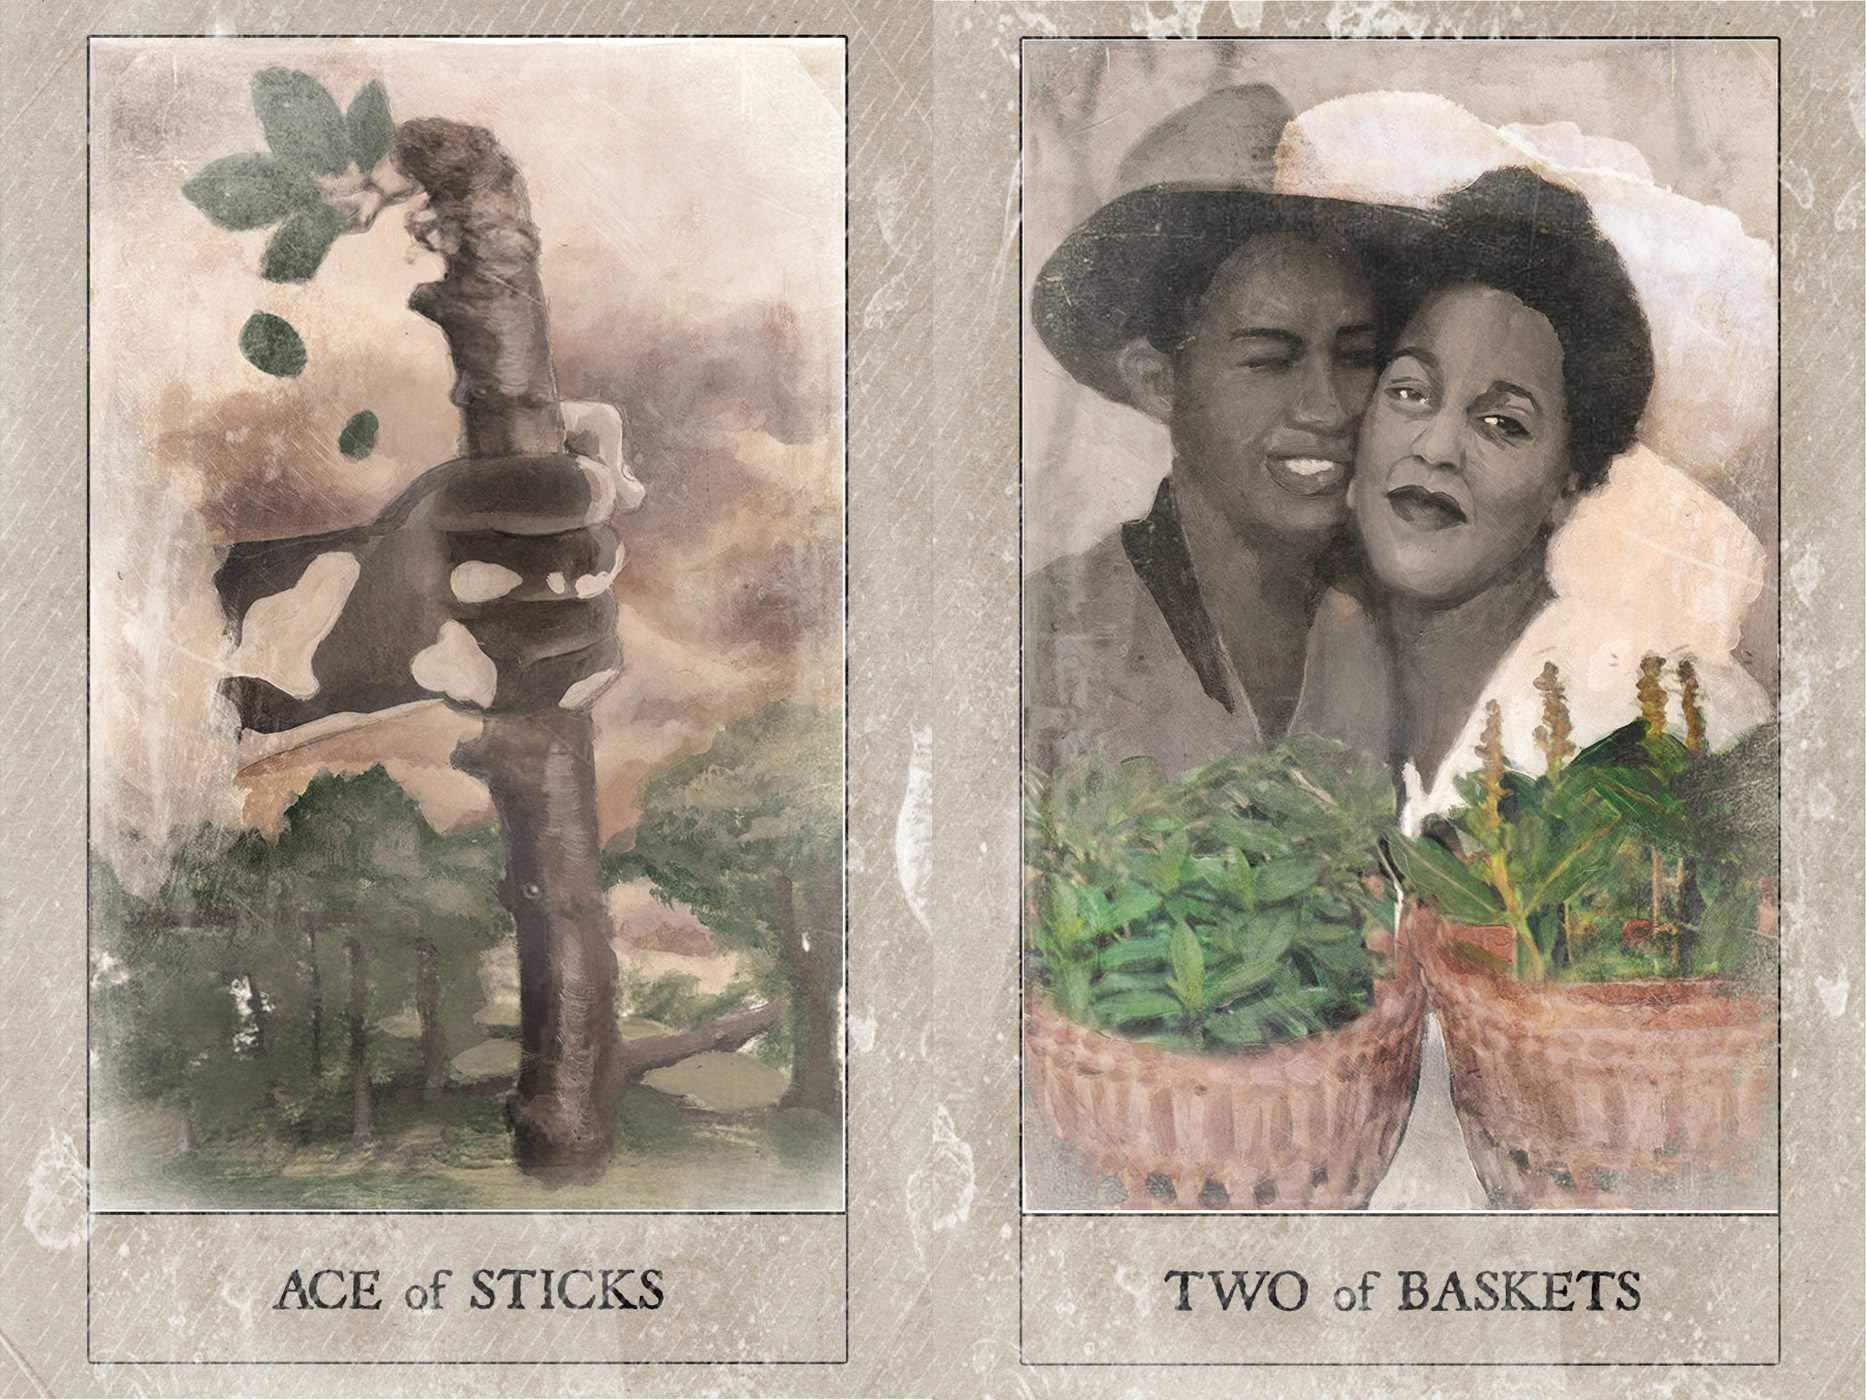 caralin 78 Cards Deck The Hoodoo Tarots Full English Oracle Card Family Party Board Game Art Paper Tarots